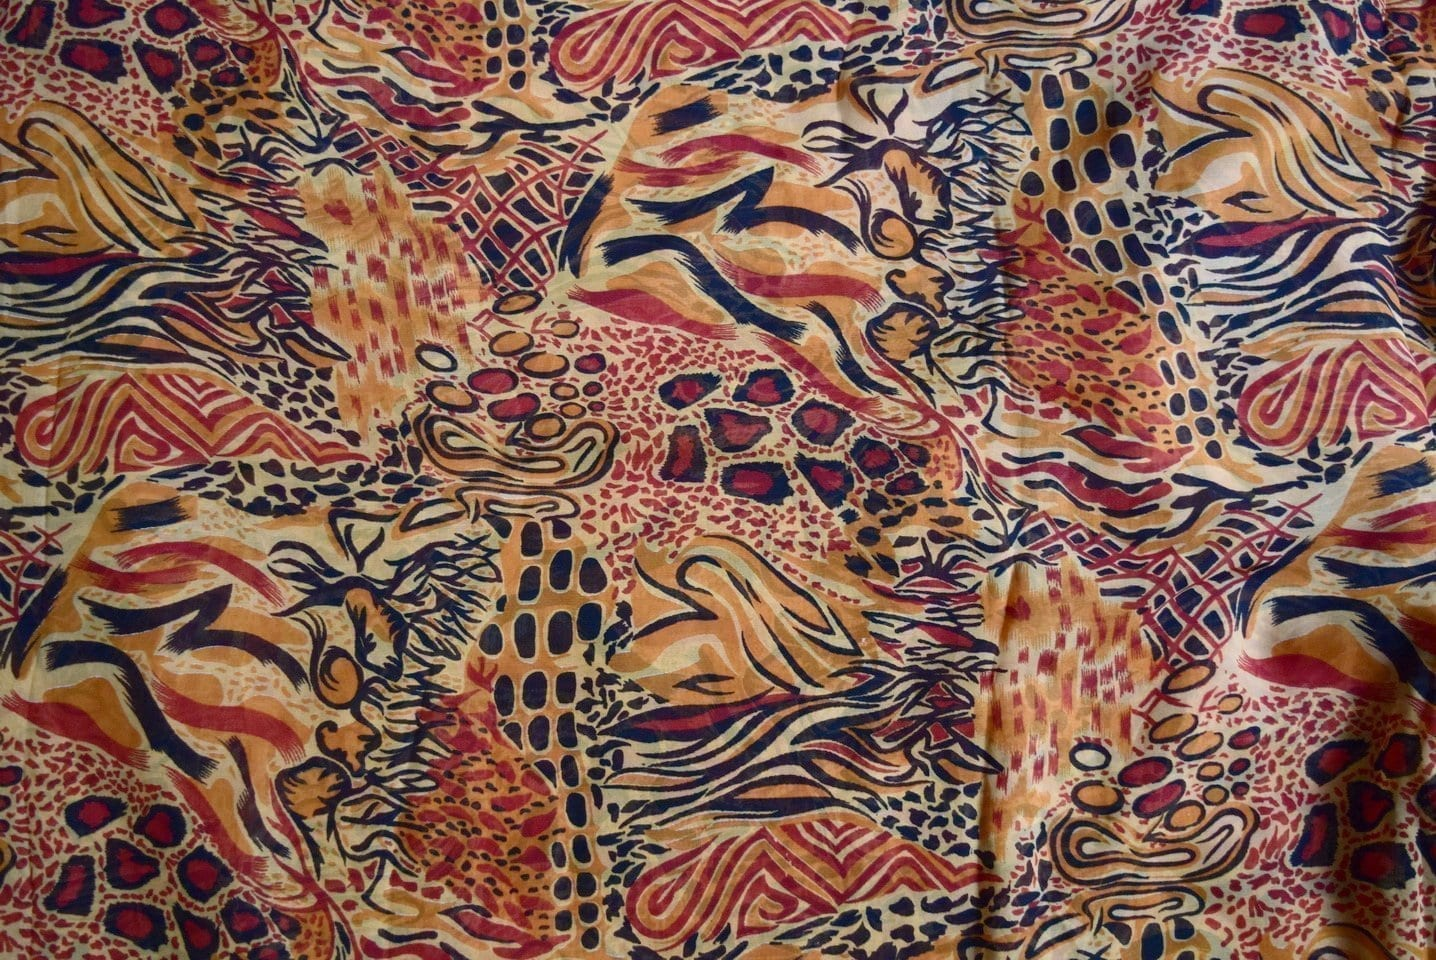 GEORGETTE PRINTED fabric for Kurti, Saree, Salwar, Dupatta GF034 2